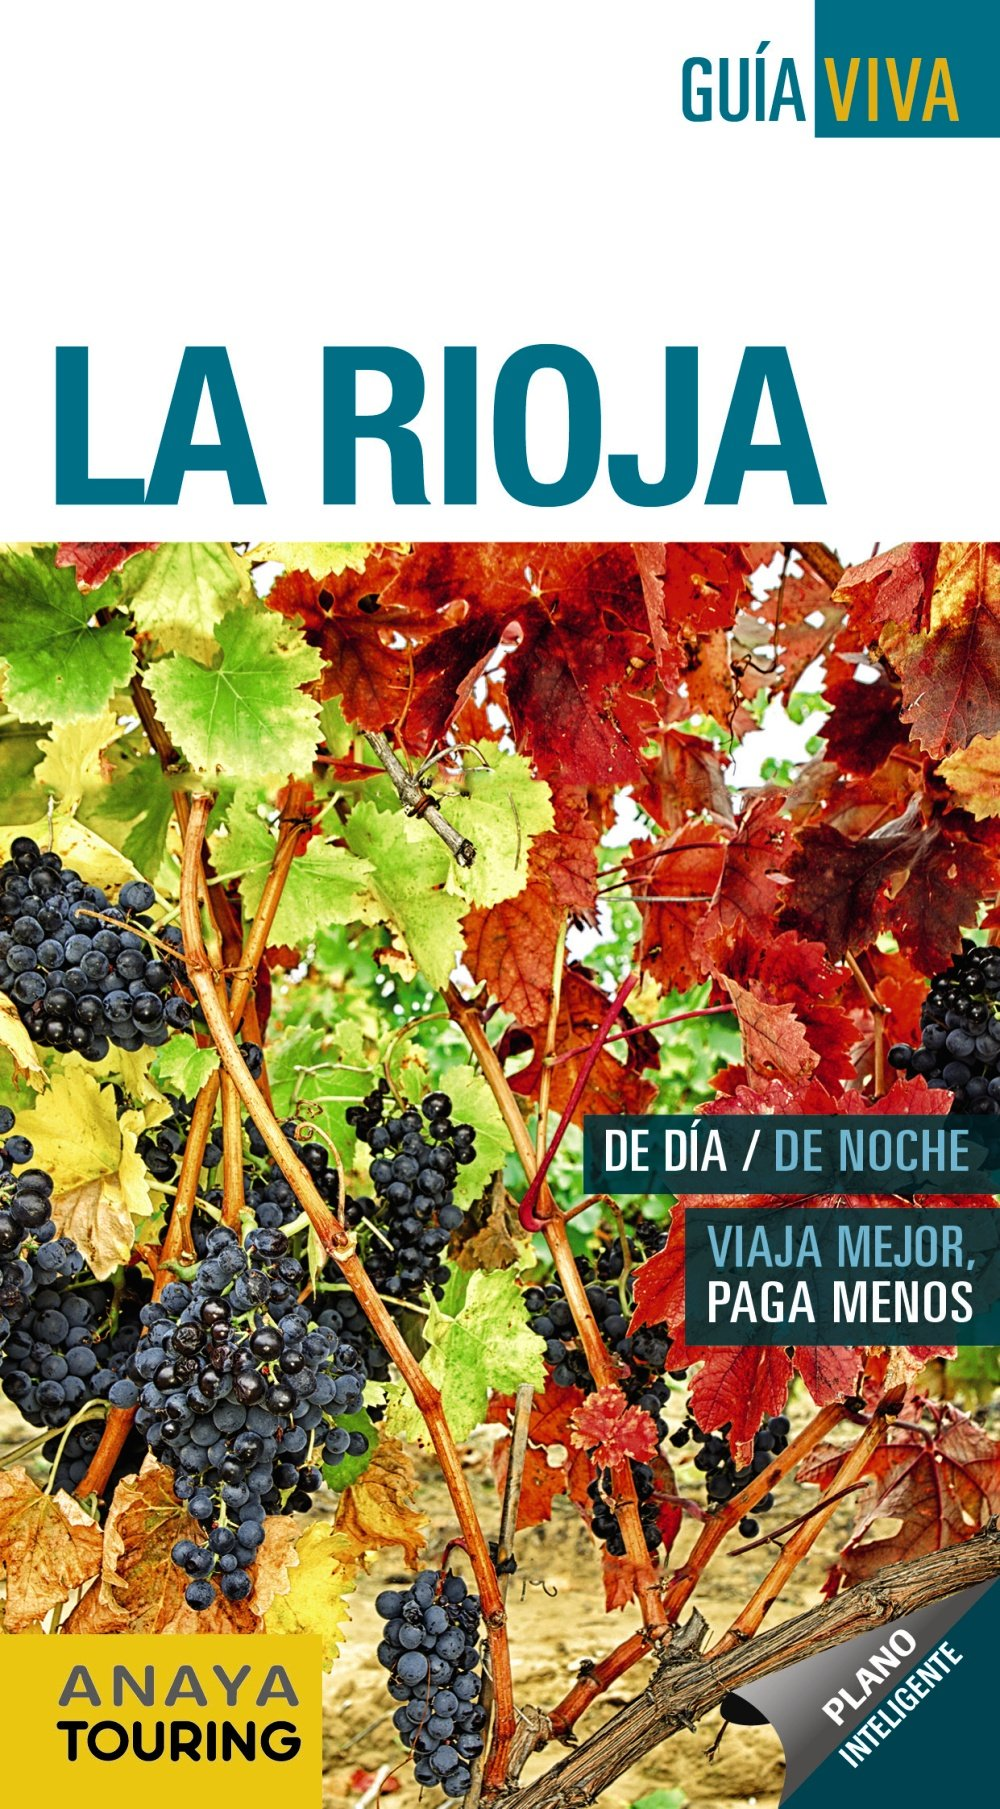 La Rioja (Guía Viva - España): Amazon.es: Anaya Touring, Ramos Campos, Alfredo, Hernández Colorado, Arantxa, Gómez, Iñaki: Libros